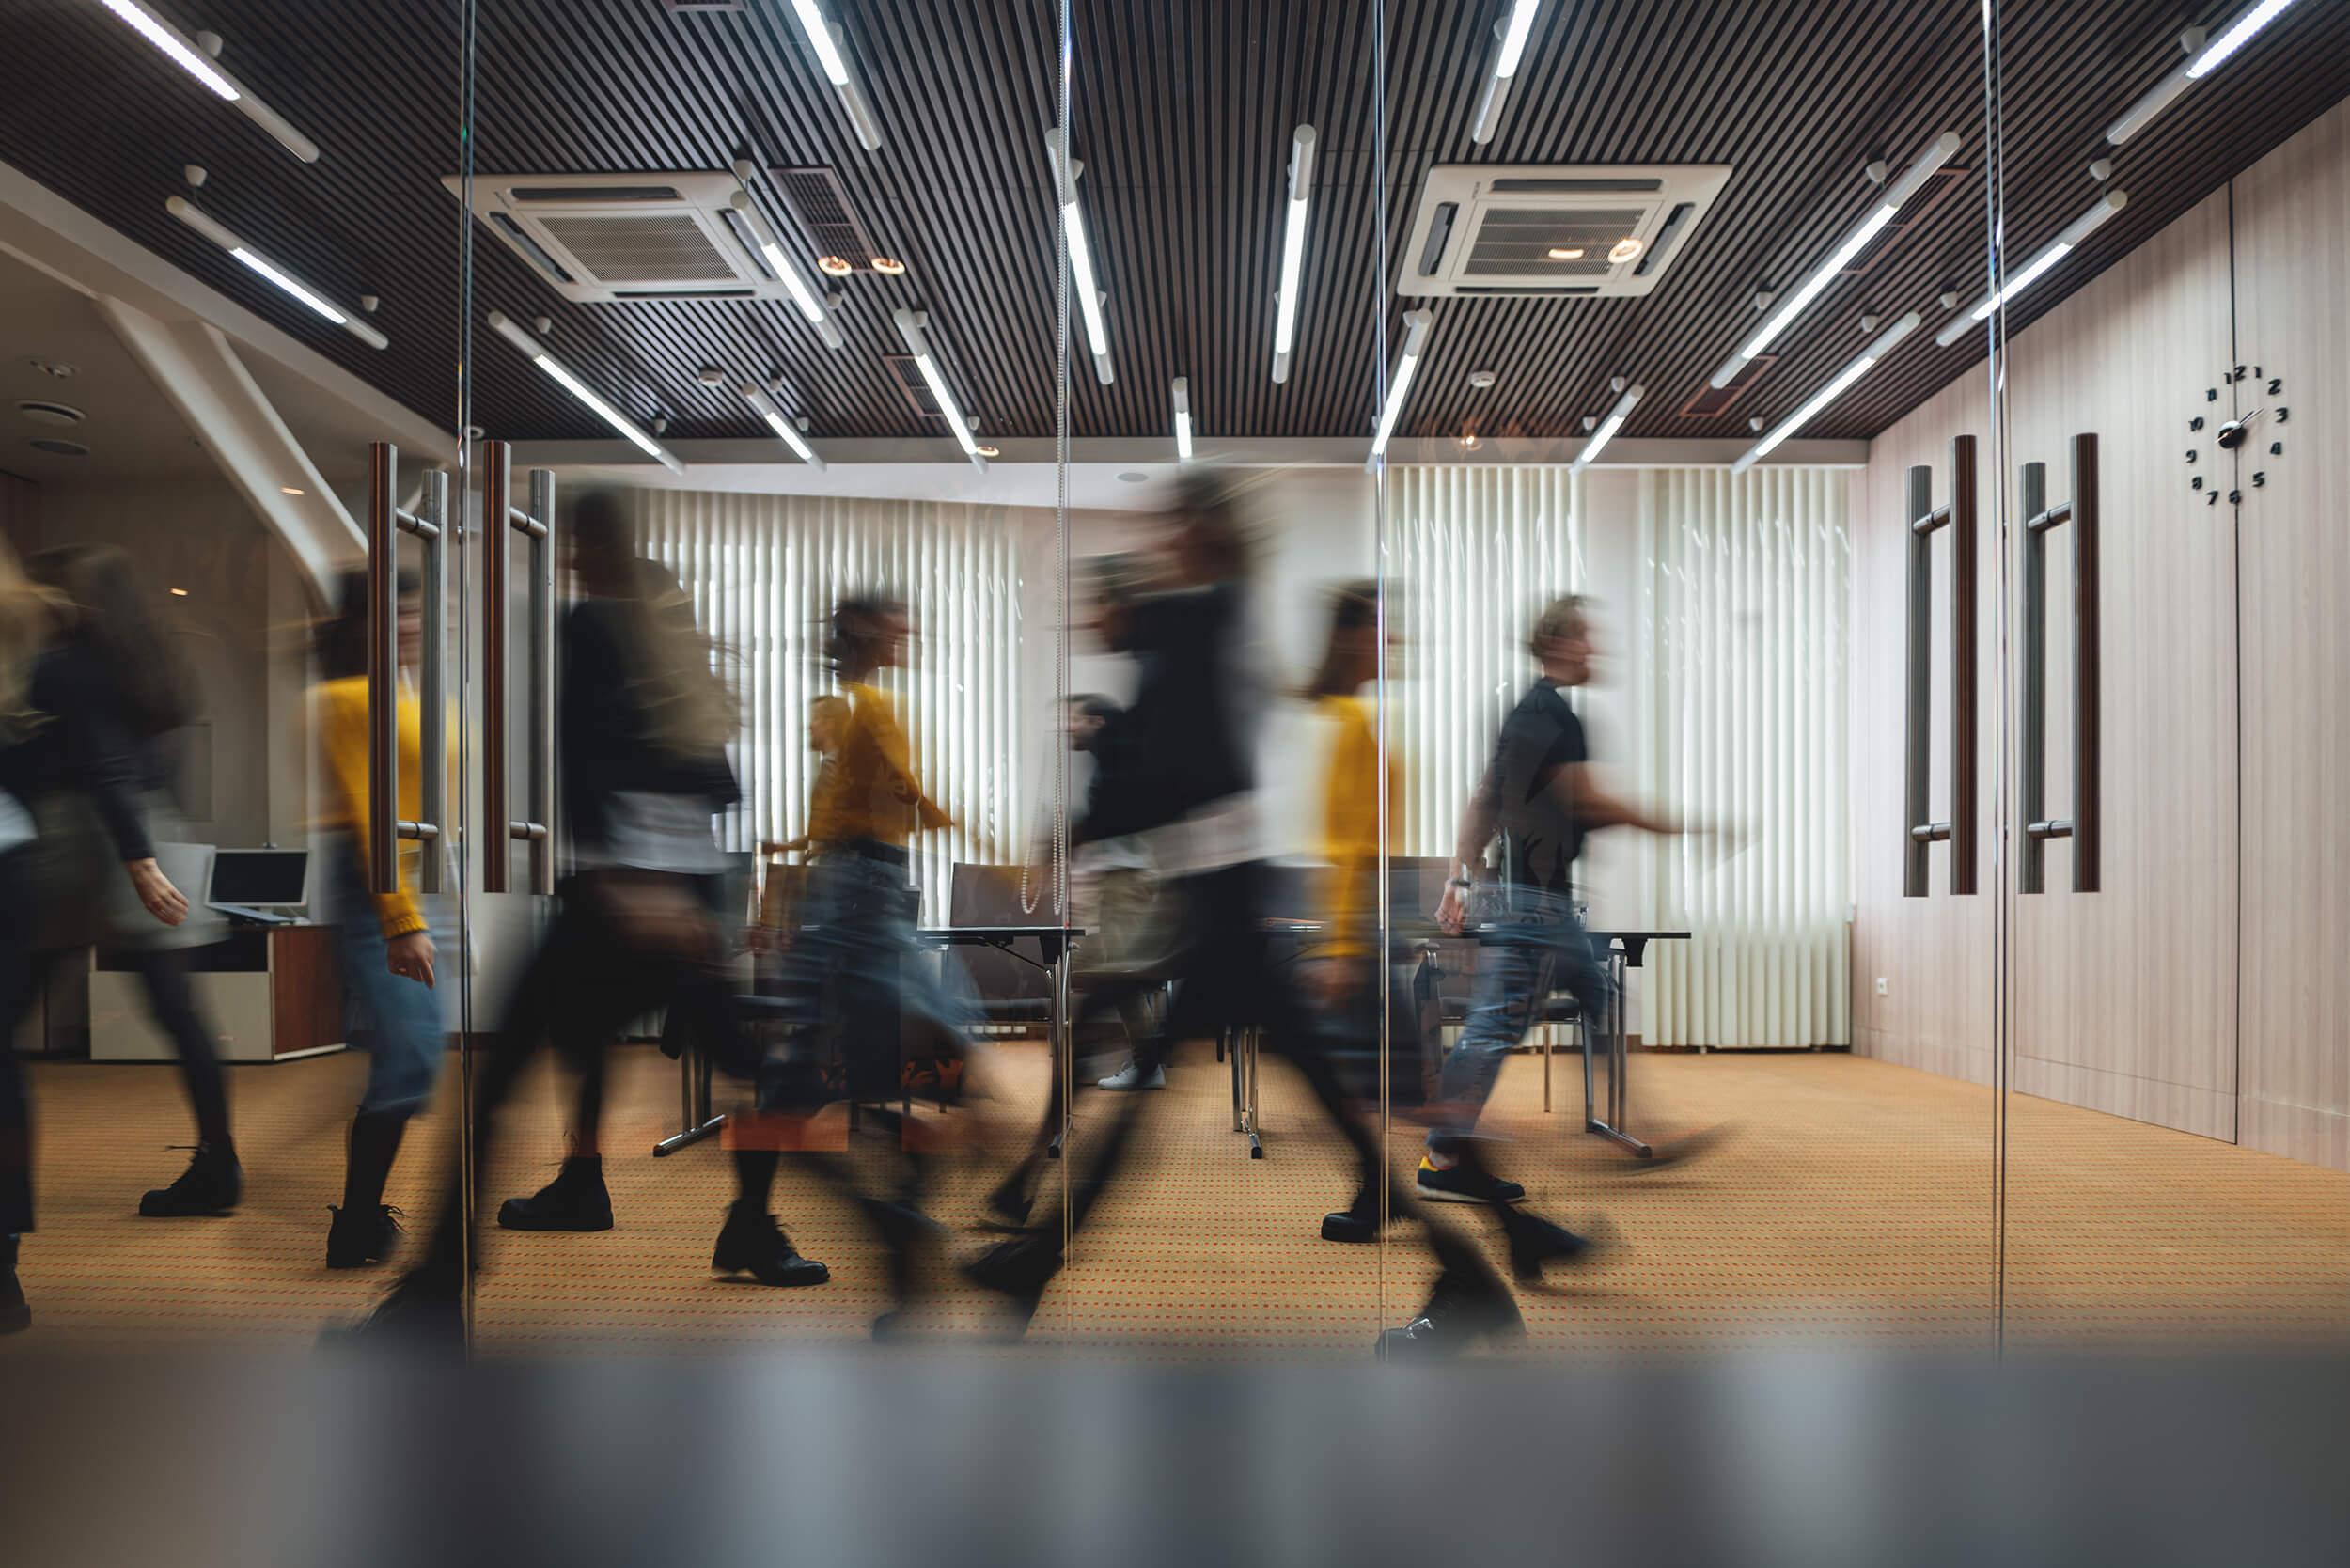 People walking Adobe Stock